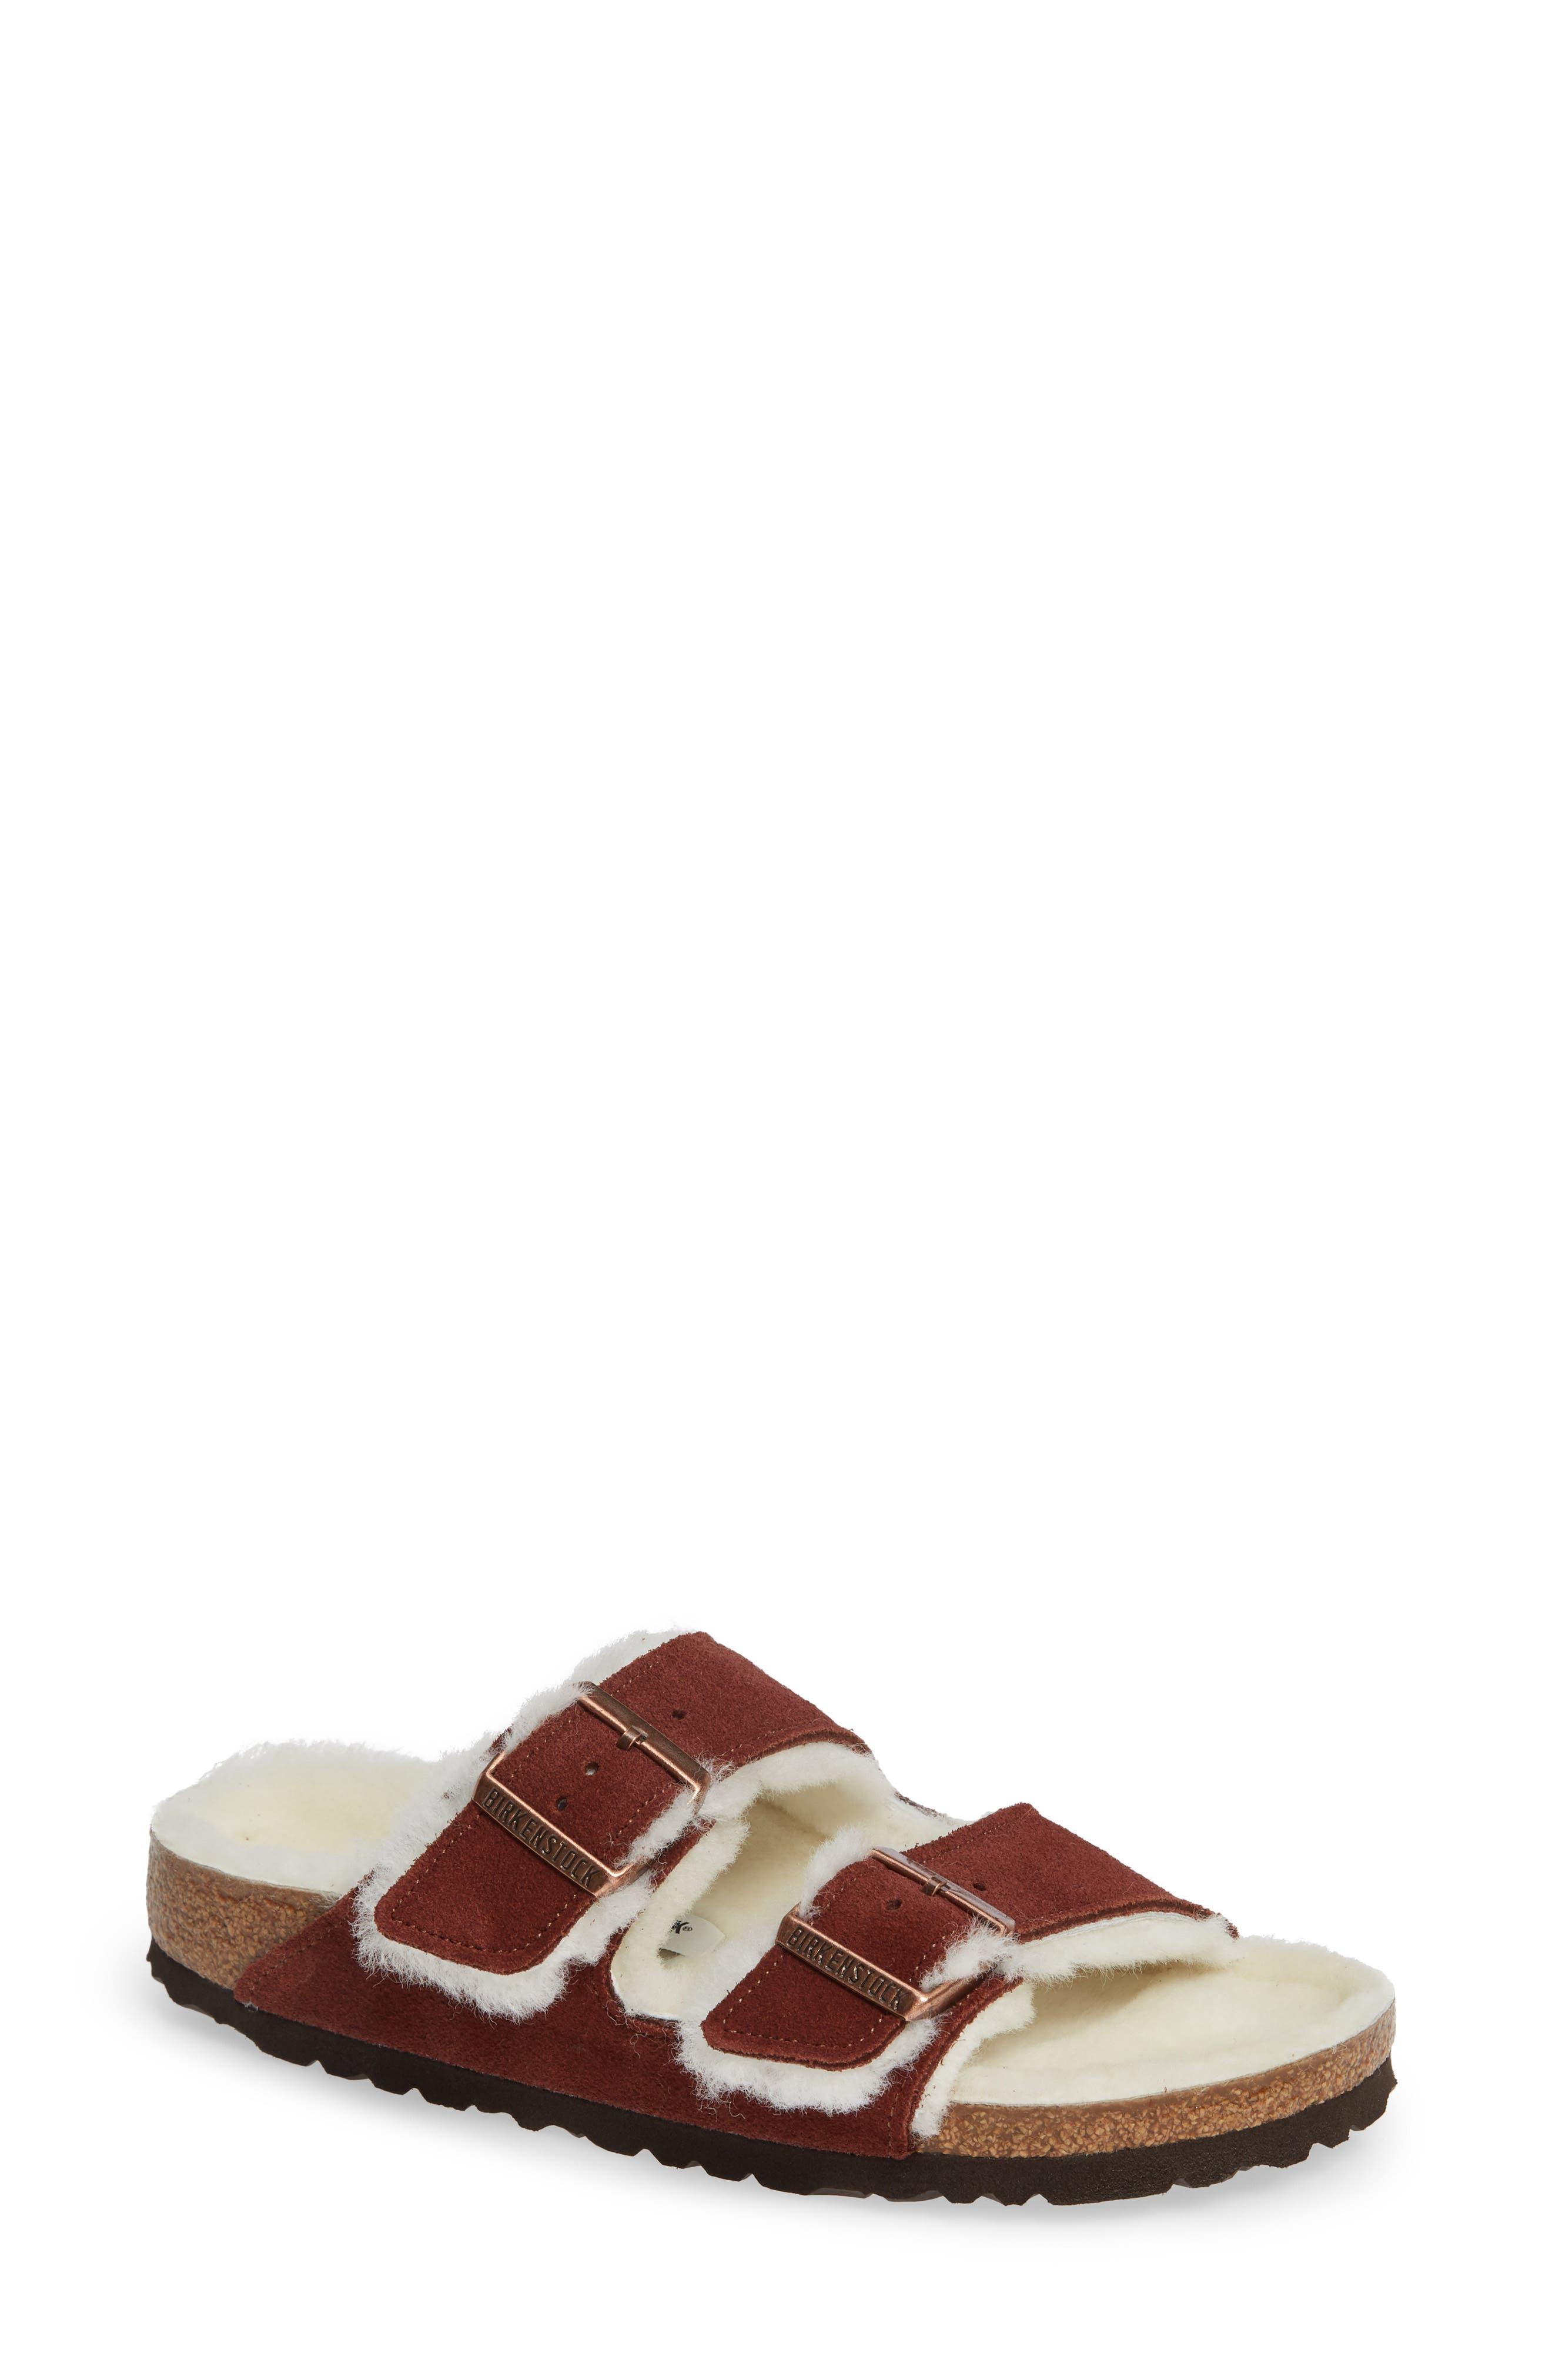 'Arizona' Genuine Shearling Lined Sandal,                             Main thumbnail 1, color,                             PORT SUEDE